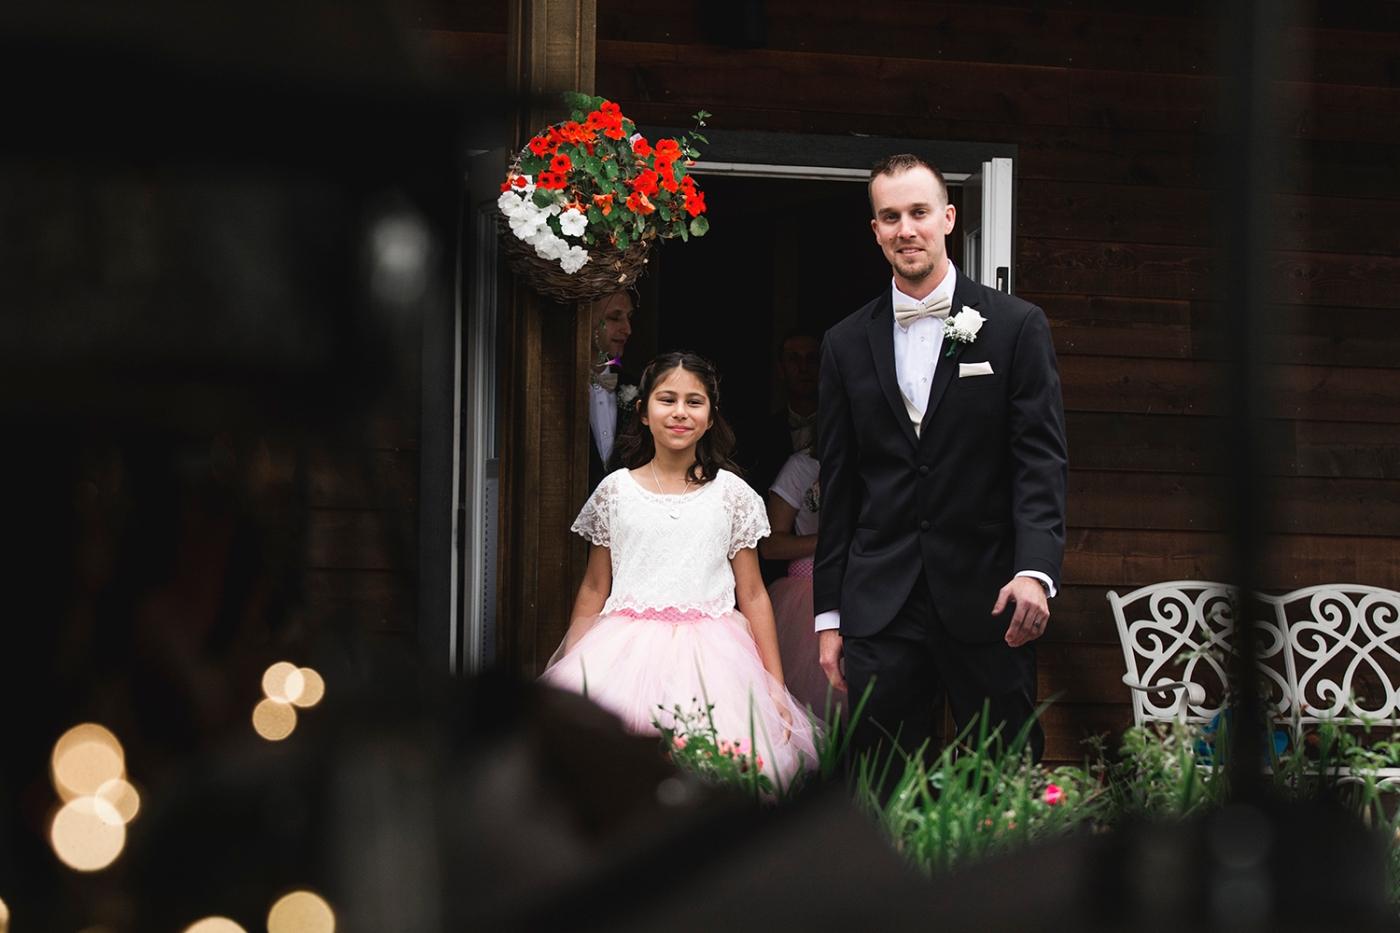 Jane_Speleers_2016_arriving to reception _Wedding_Wild_Rose_Estates_Venue_JS7_7838